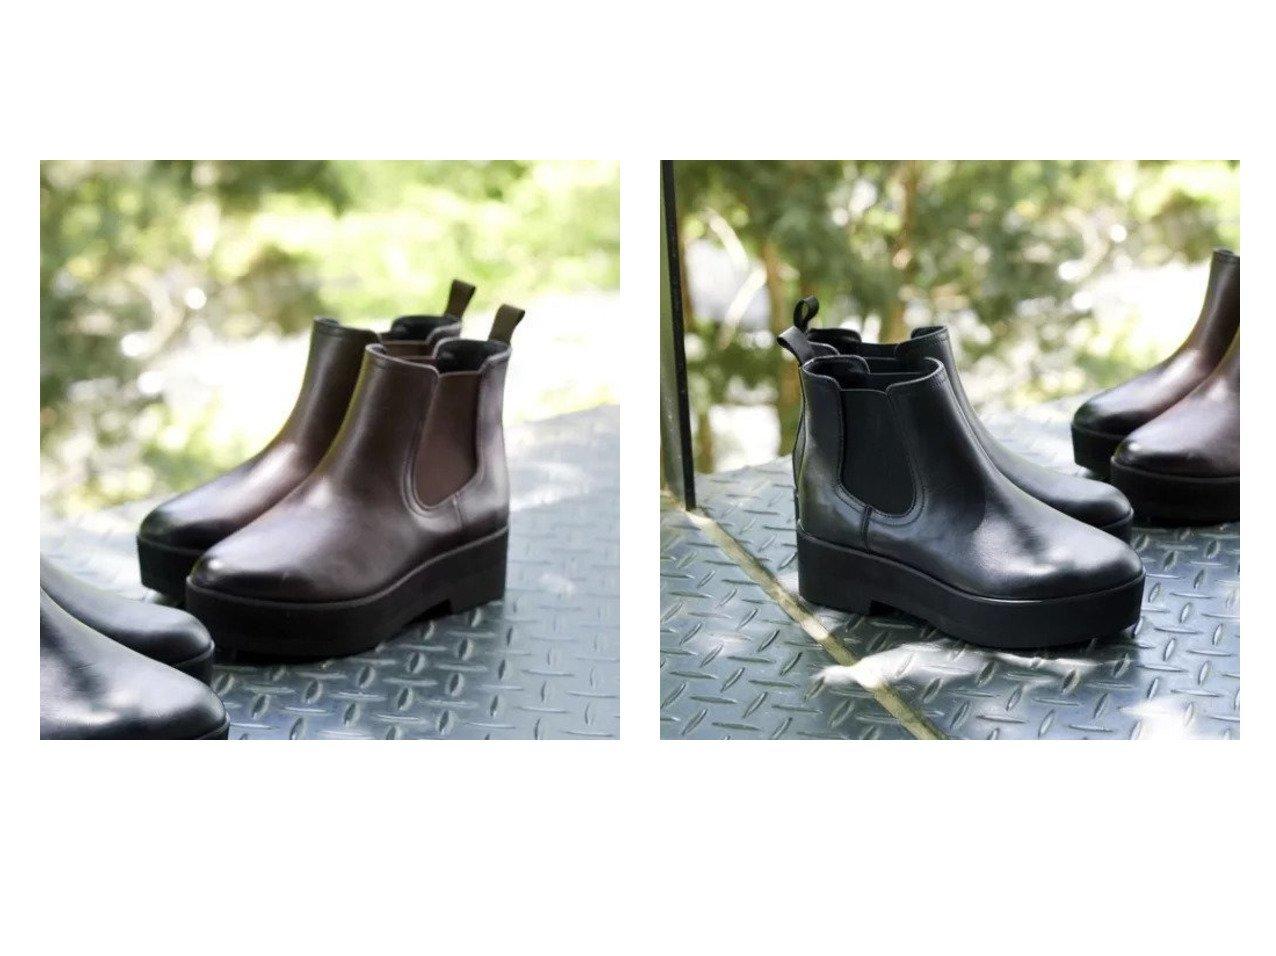 【Odette e Odile/オデット エ オディール】のO プラットフォームサイドゴア ショートブーツ 【シューズ・靴】おすすめ!人気、トレンド・レディースファッションの通販 おすすめで人気の流行・トレンド、ファッションの通販商品 インテリア・家具・メンズファッション・キッズファッション・レディースファッション・服の通販 founy(ファニー) https://founy.com/ ファッション Fashion レディースファッション WOMEN シューズ ショート バランス |ID:crp329100000051248